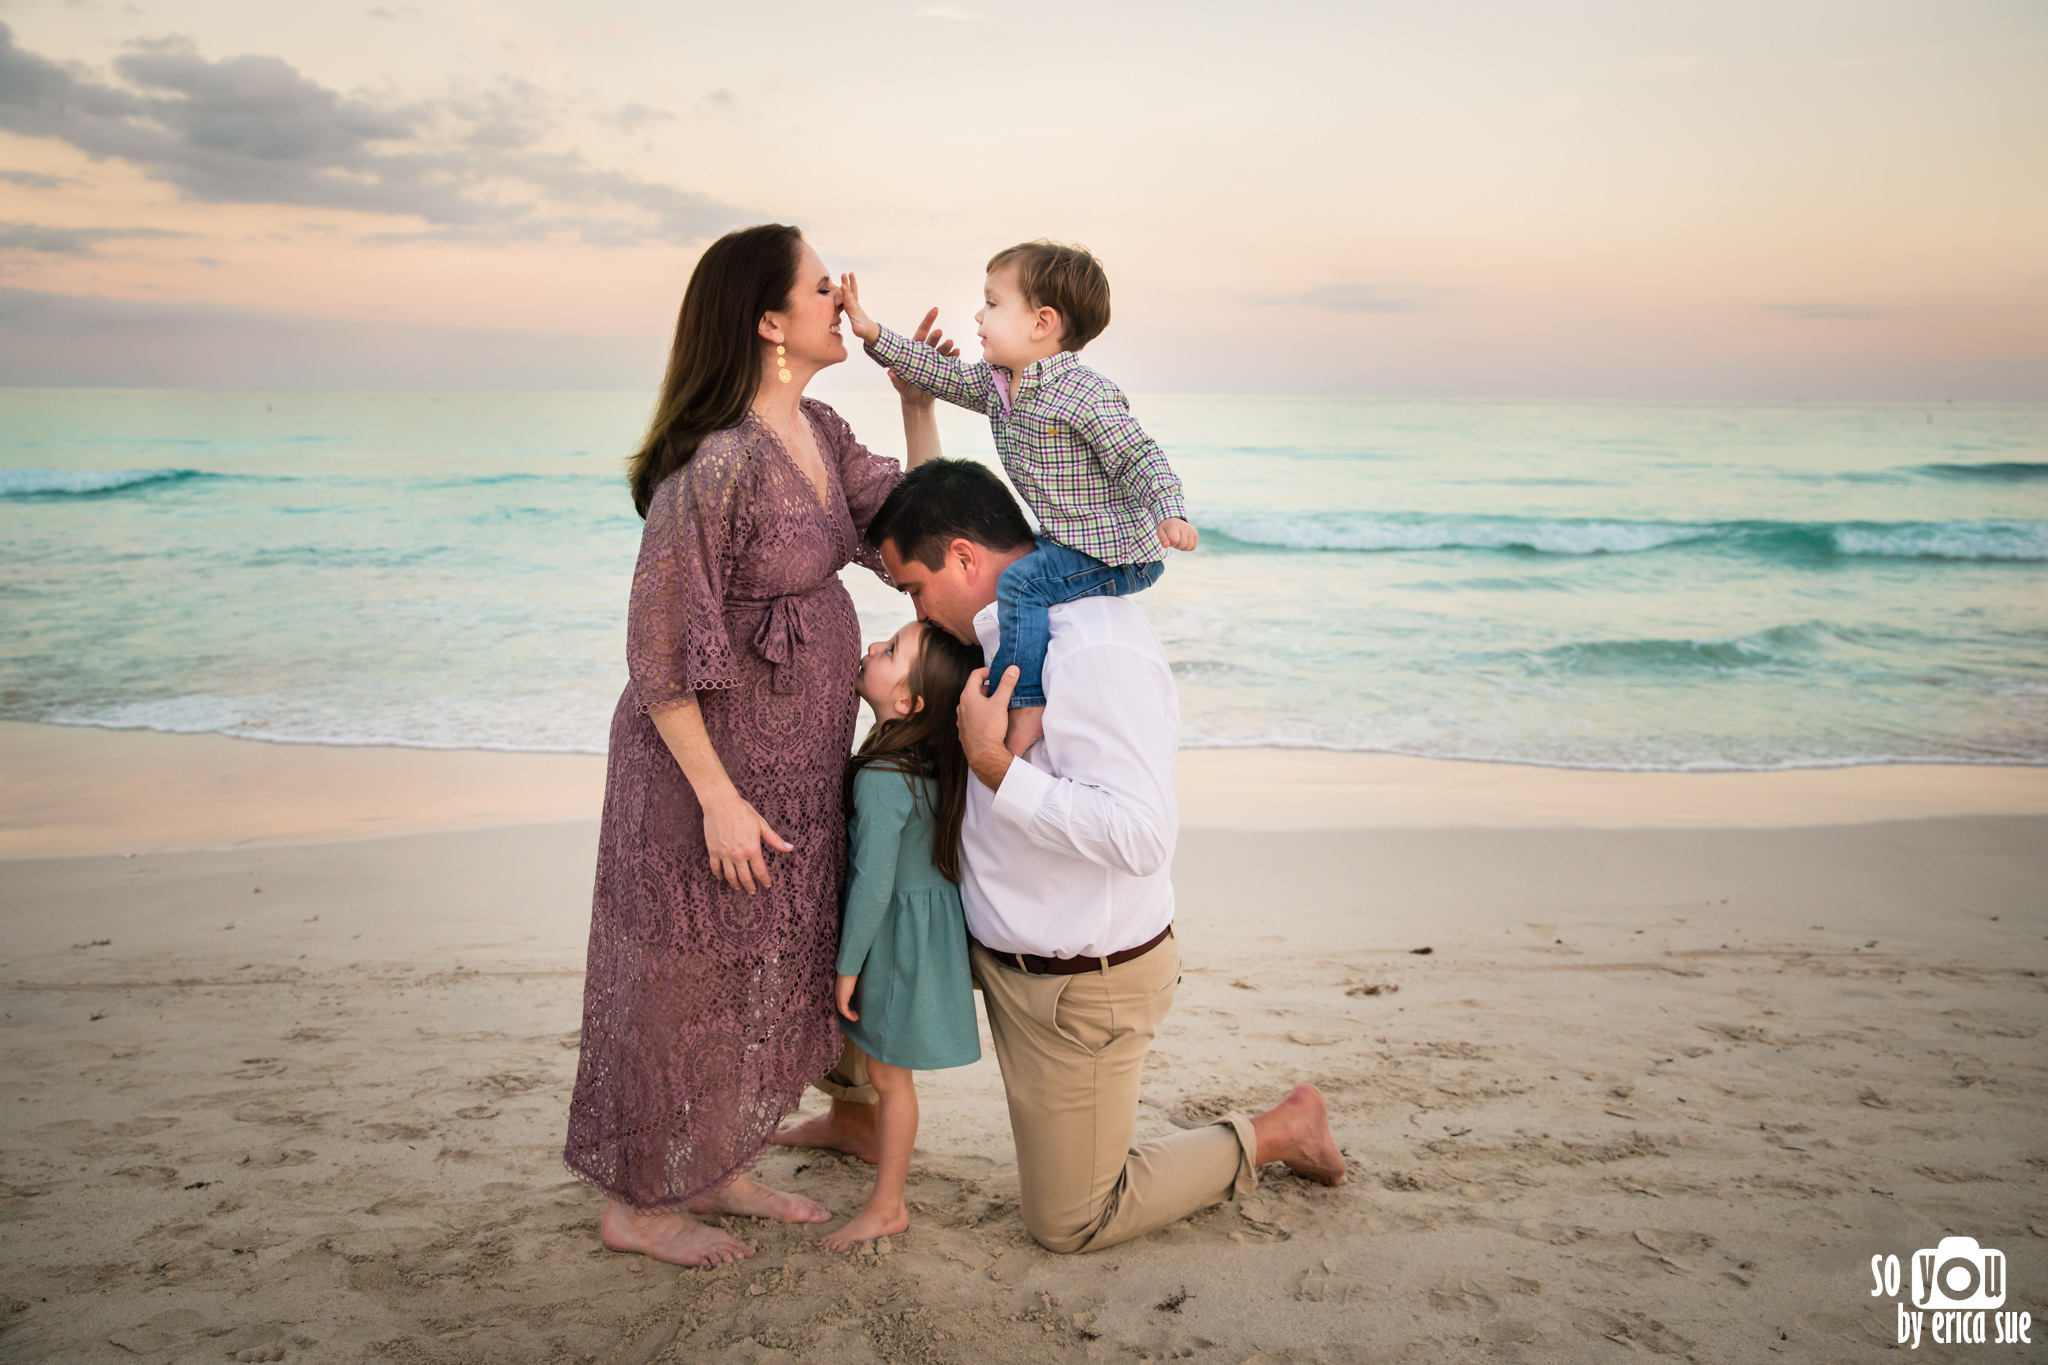 so-you-by-erica-sue-miami-maternity-photographer-south-pointe-park-9495.jpg